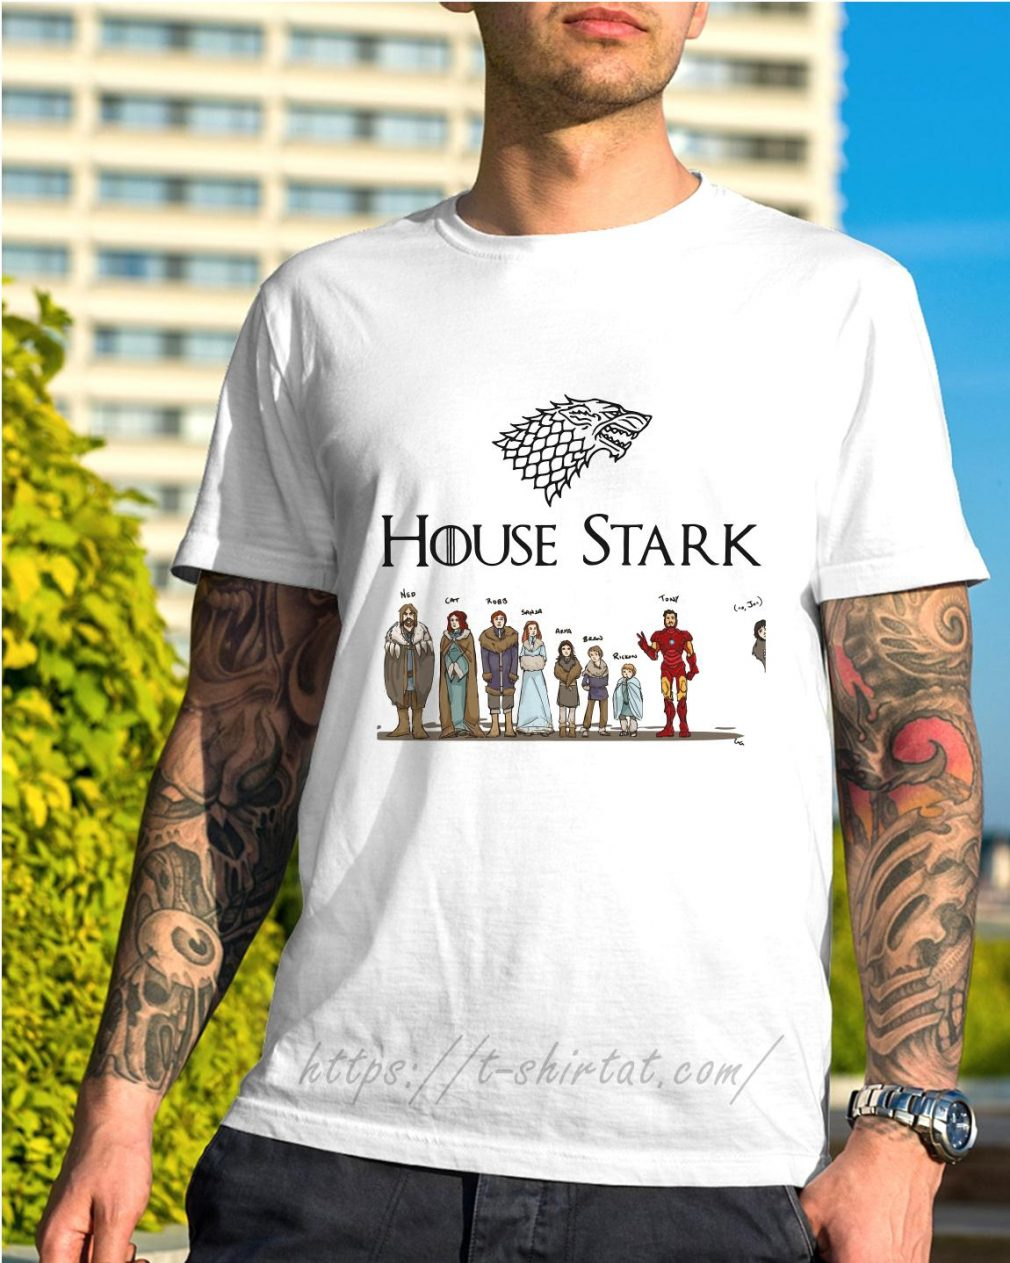 House Tony Stark Iron Man Game of Thrones shirt